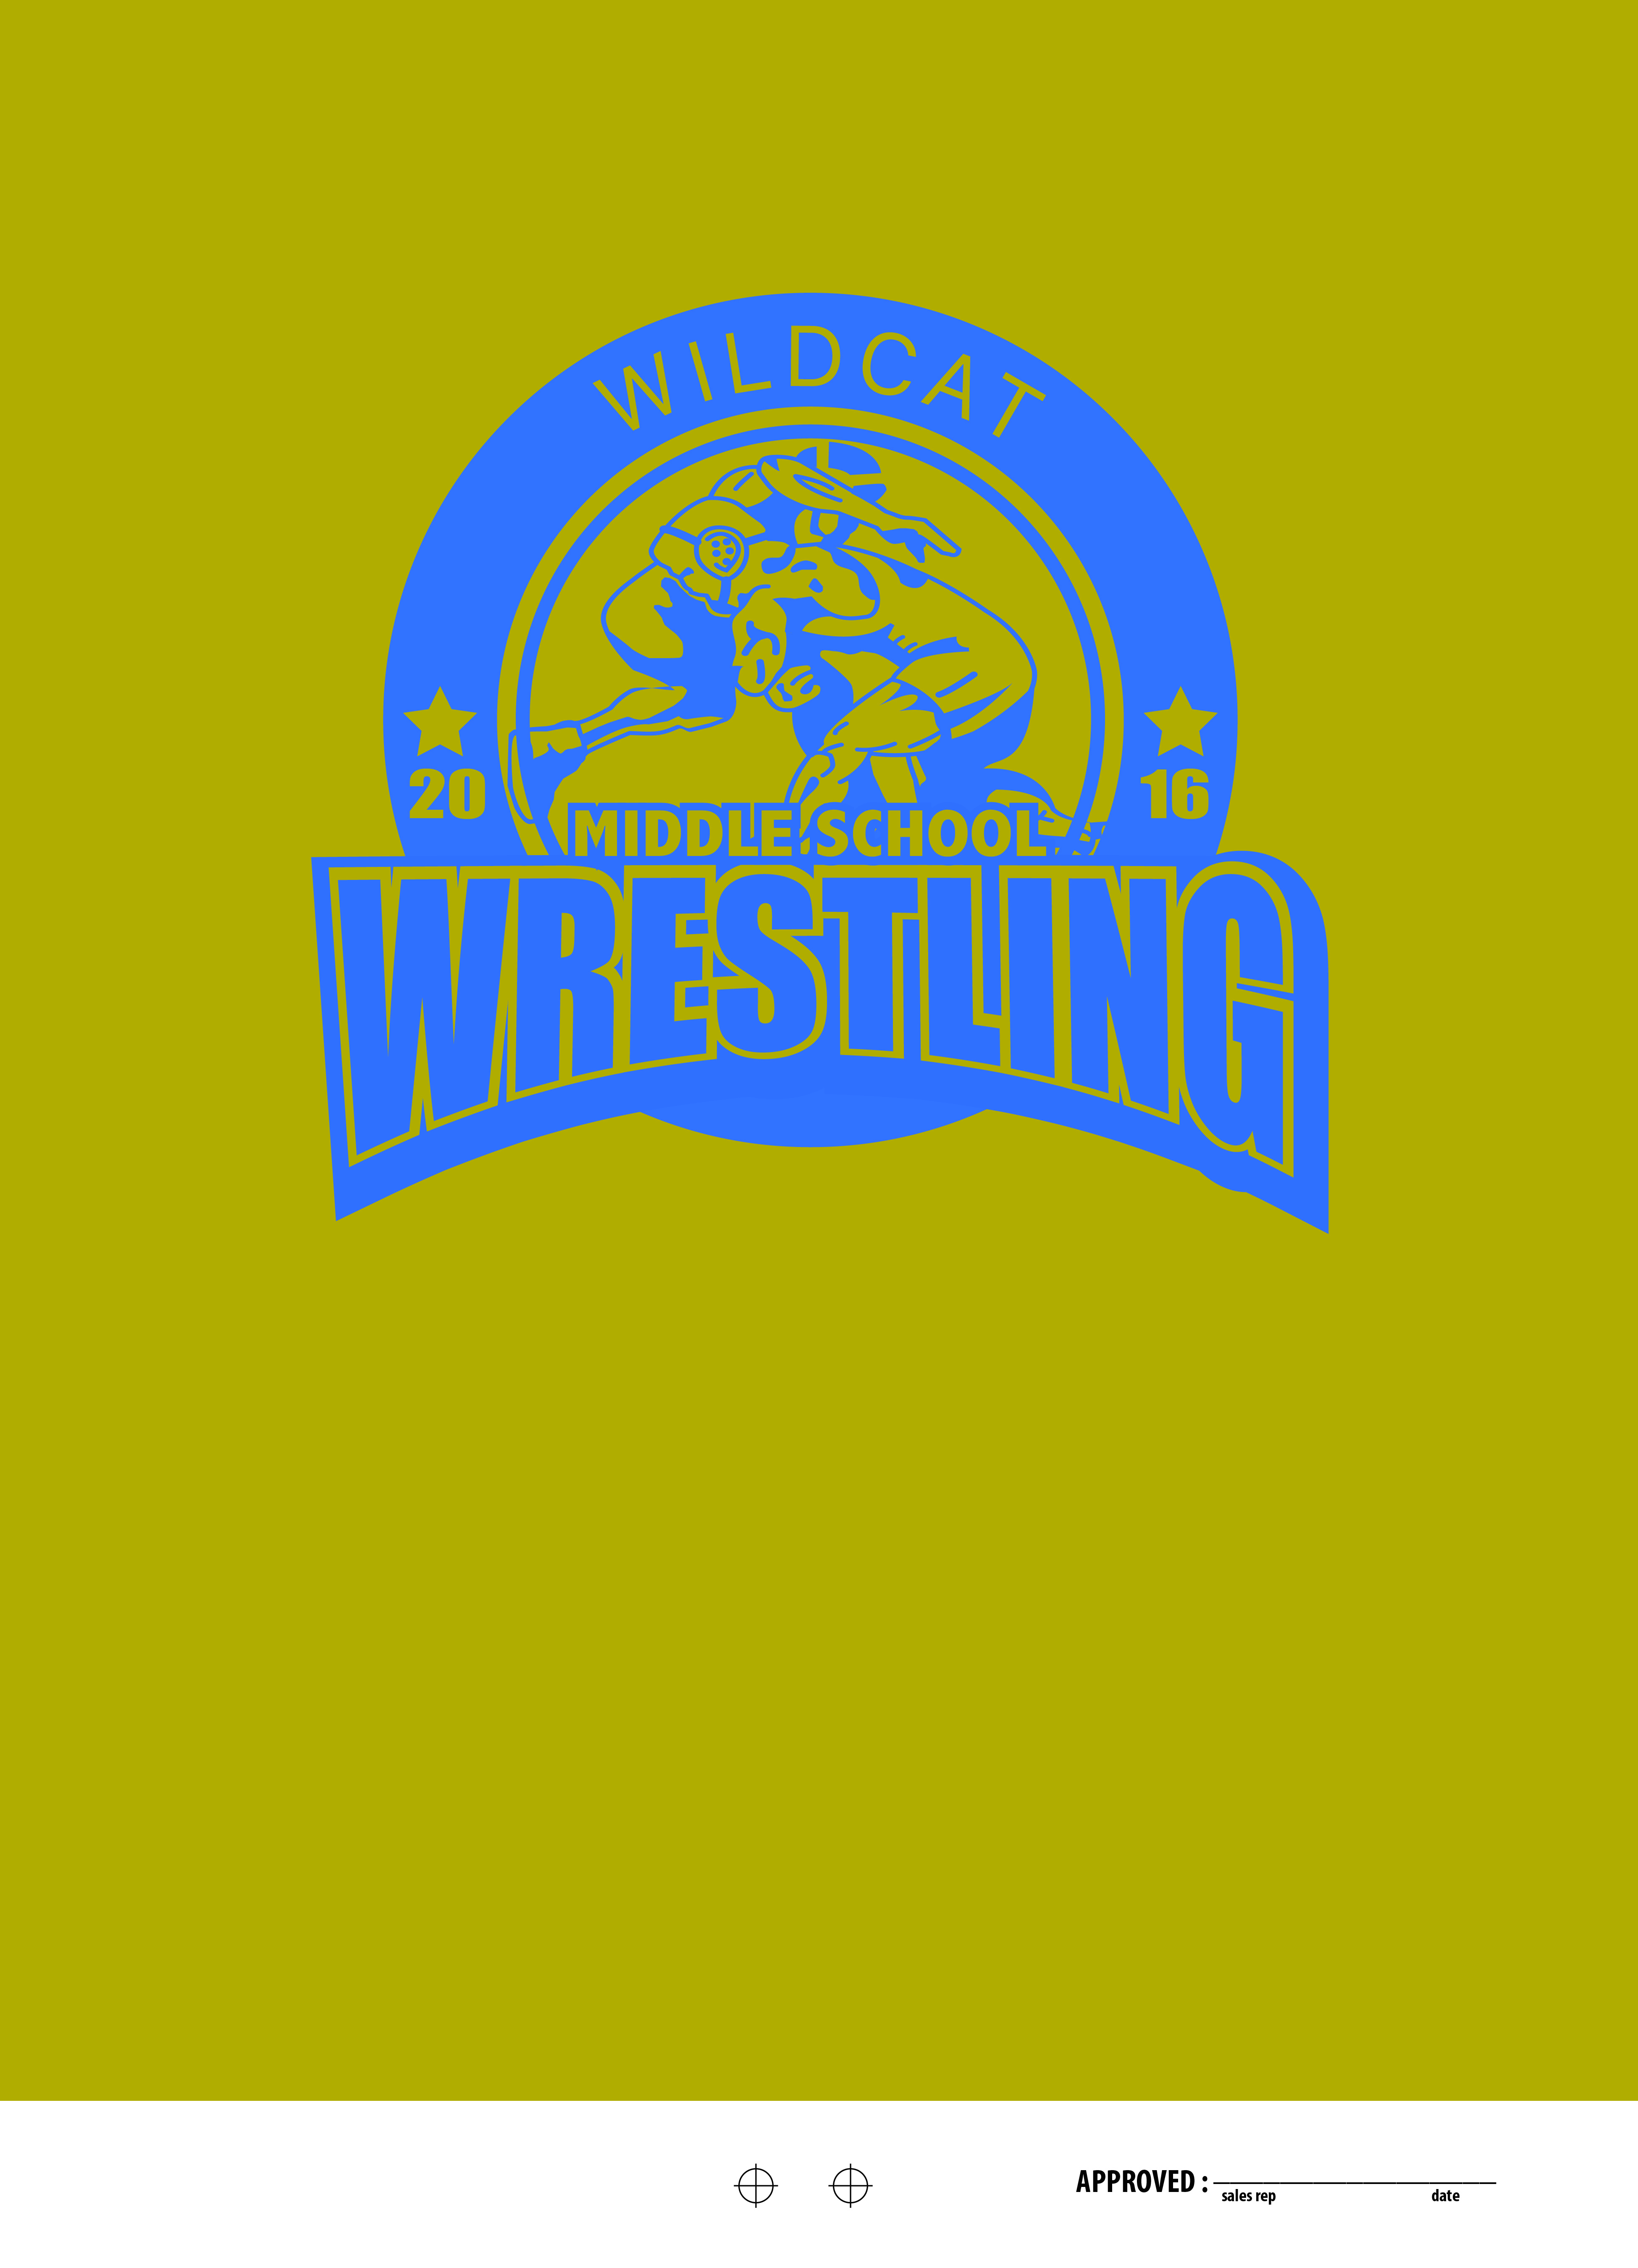 12-1-16 Springfield Wrestling-01